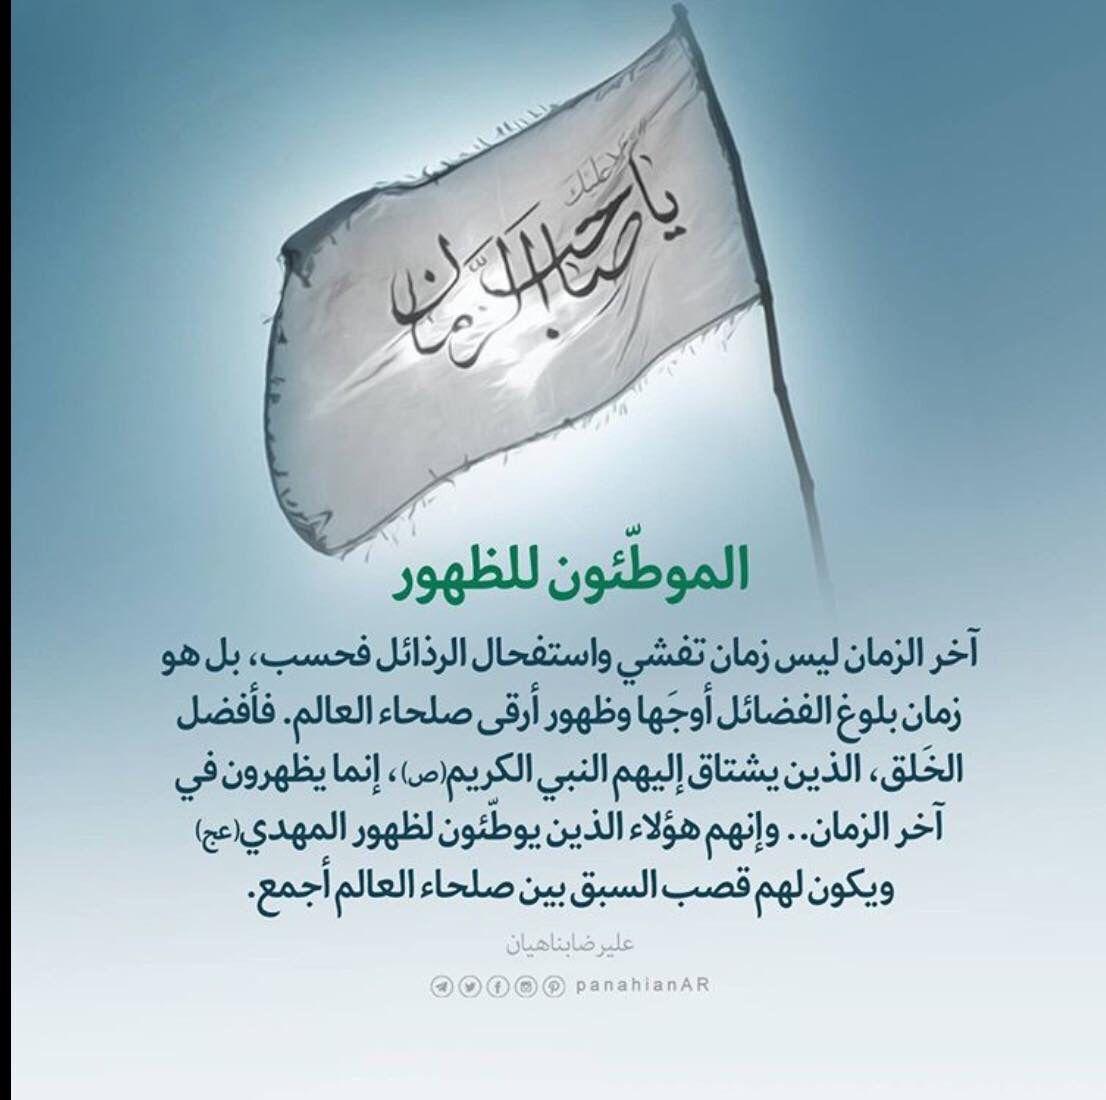 Pin By Rokbok On اسلاميات Islamic Quotes Text On Photo Wisdom